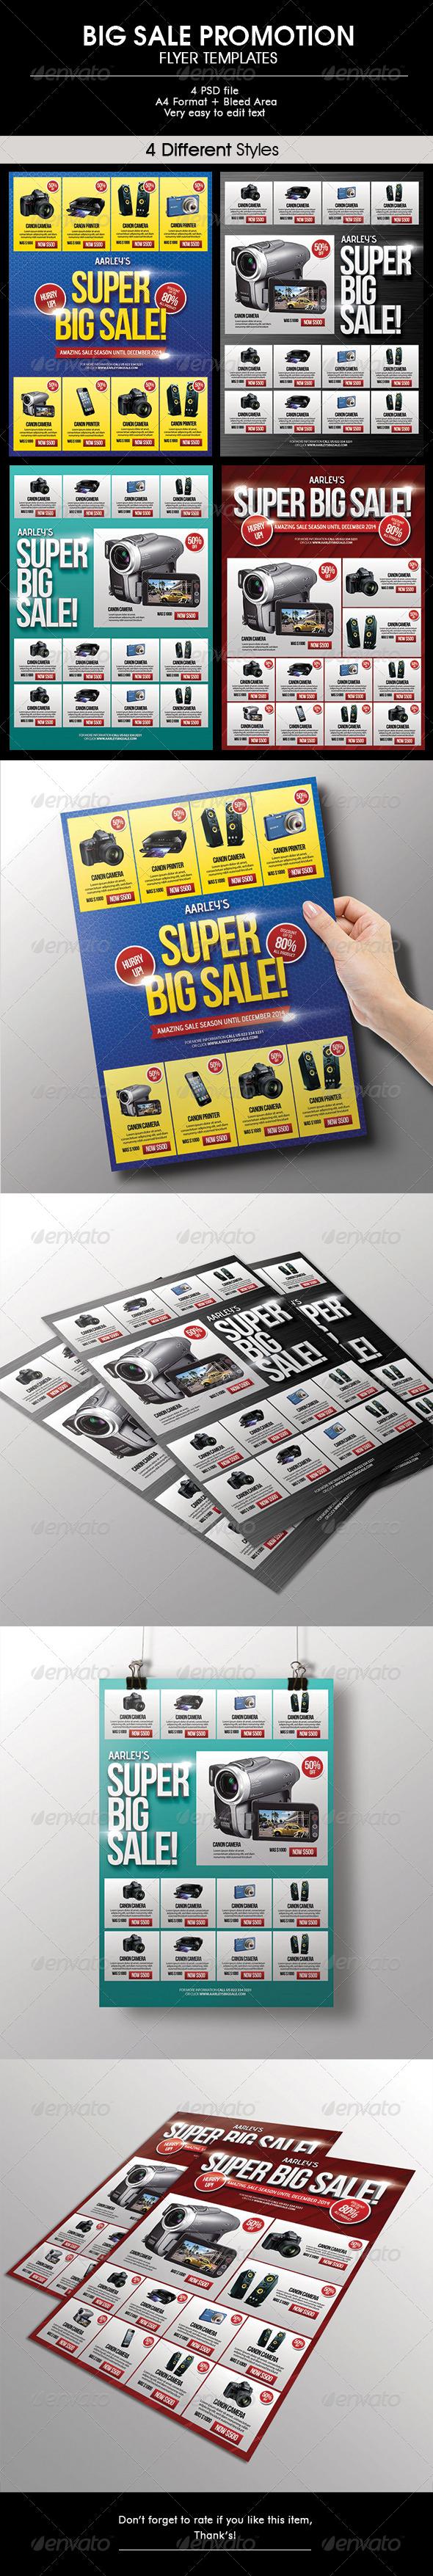 GraphicRiver Big Sale Promotion Flyer 6581555